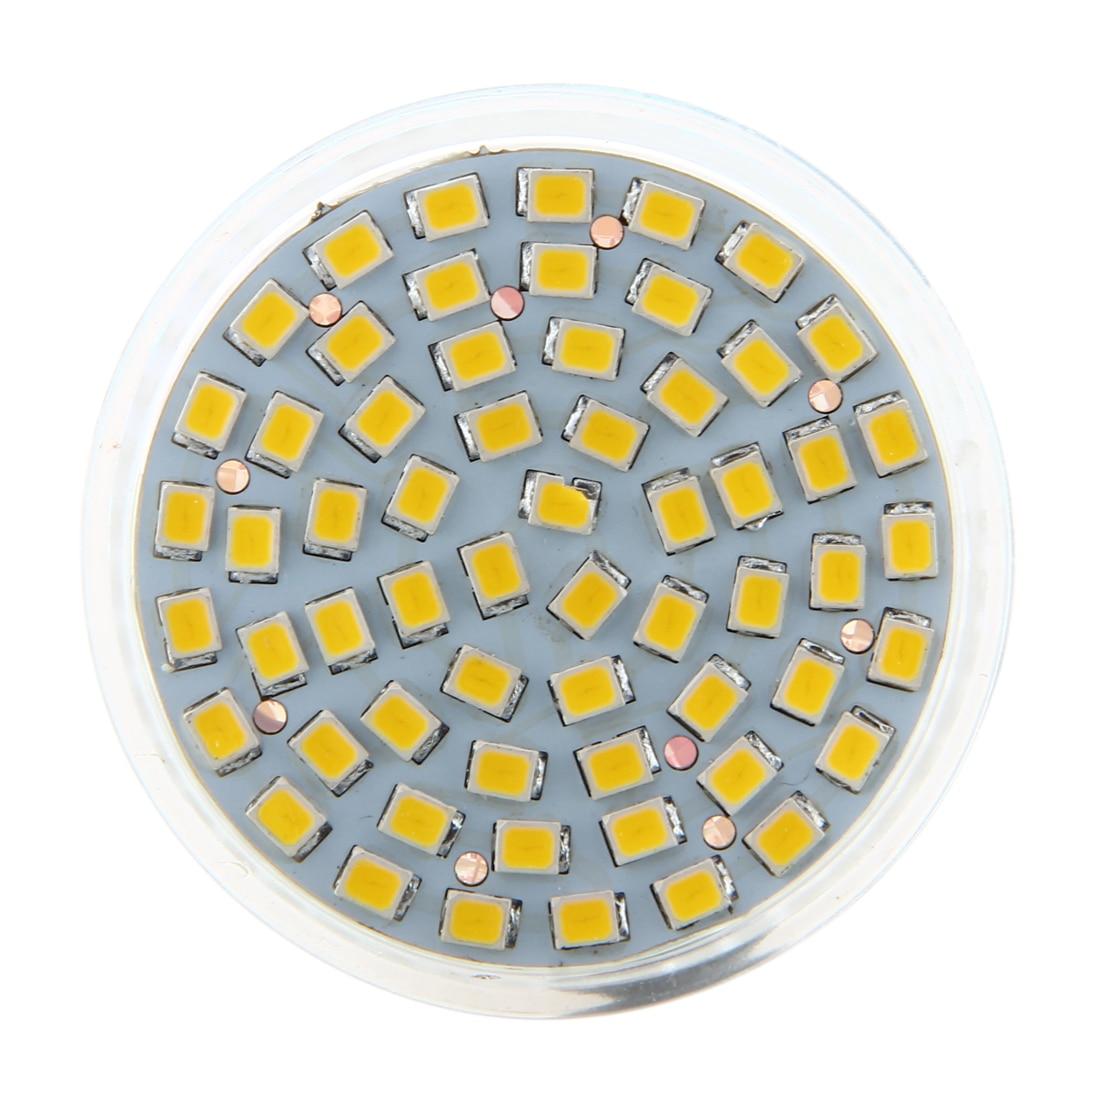 MR16 GU5,3 60 LED 3528 SMD 3W SPOT LIGHT BULB warm white 12V